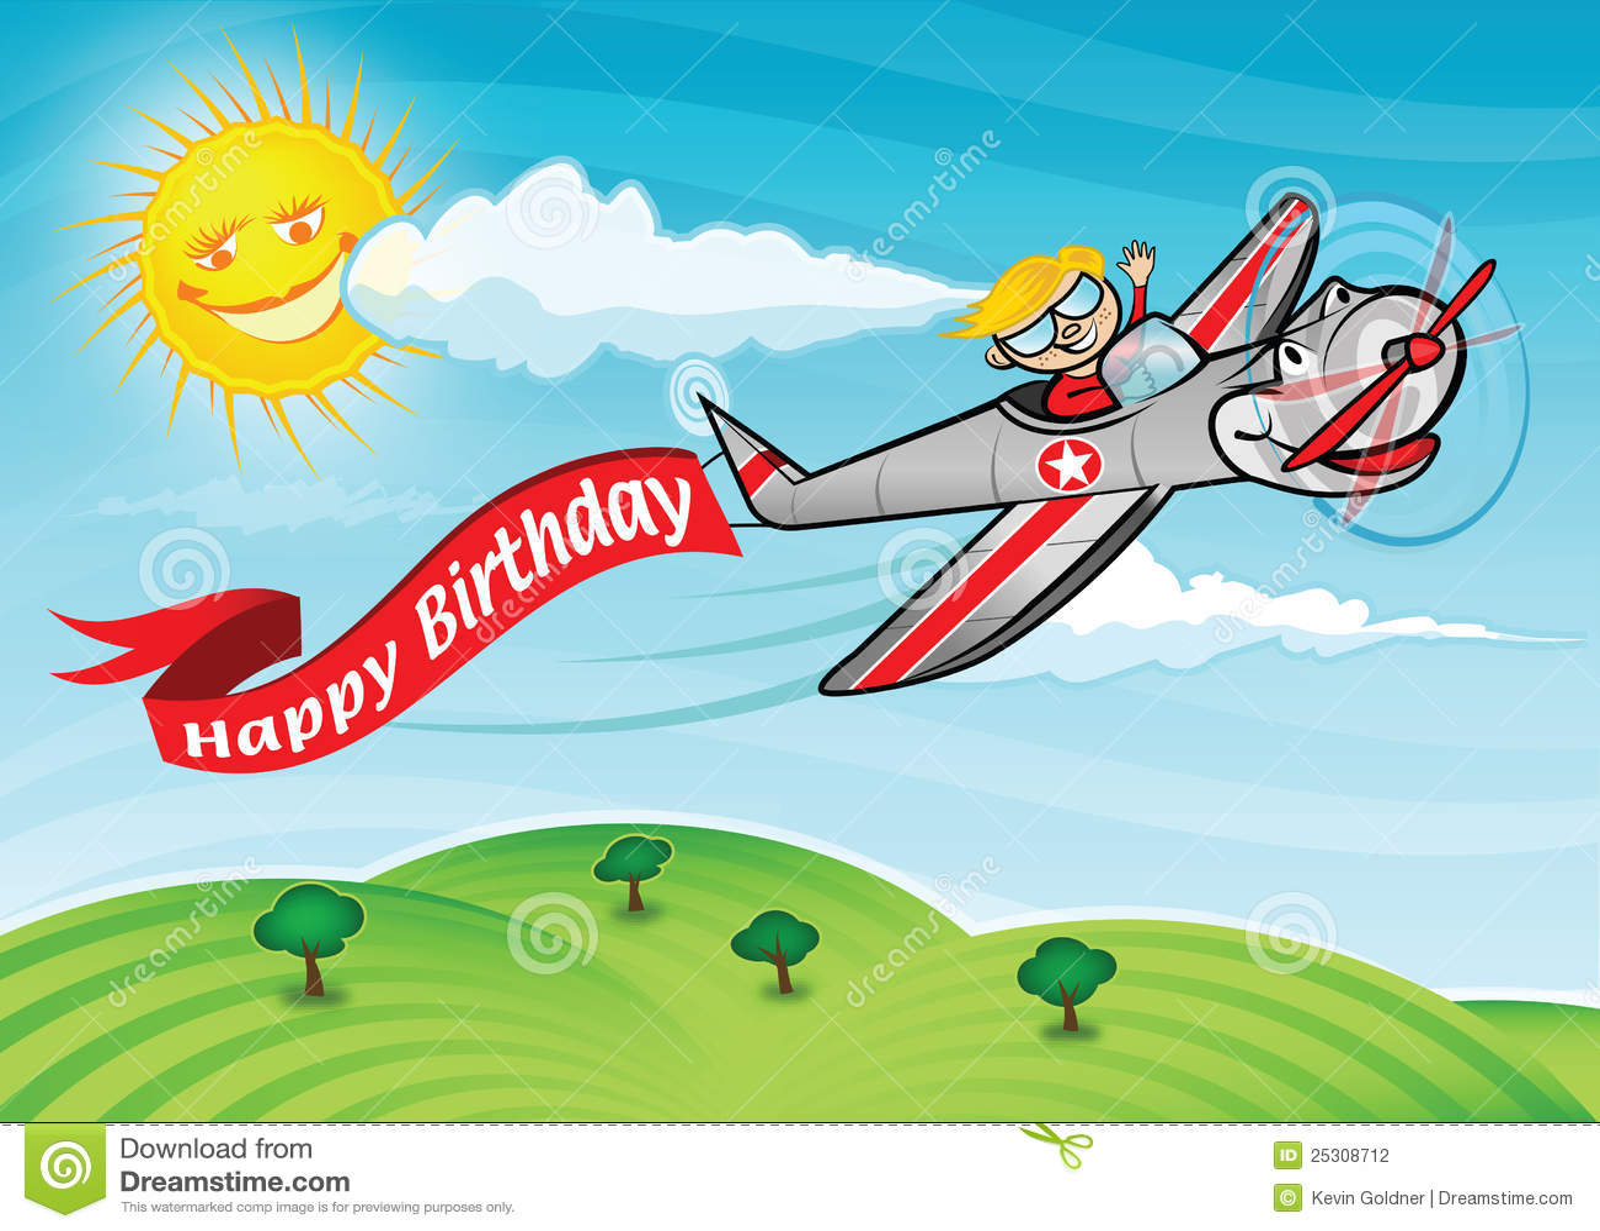 Airplane Birthday Invitation is nice invitation template